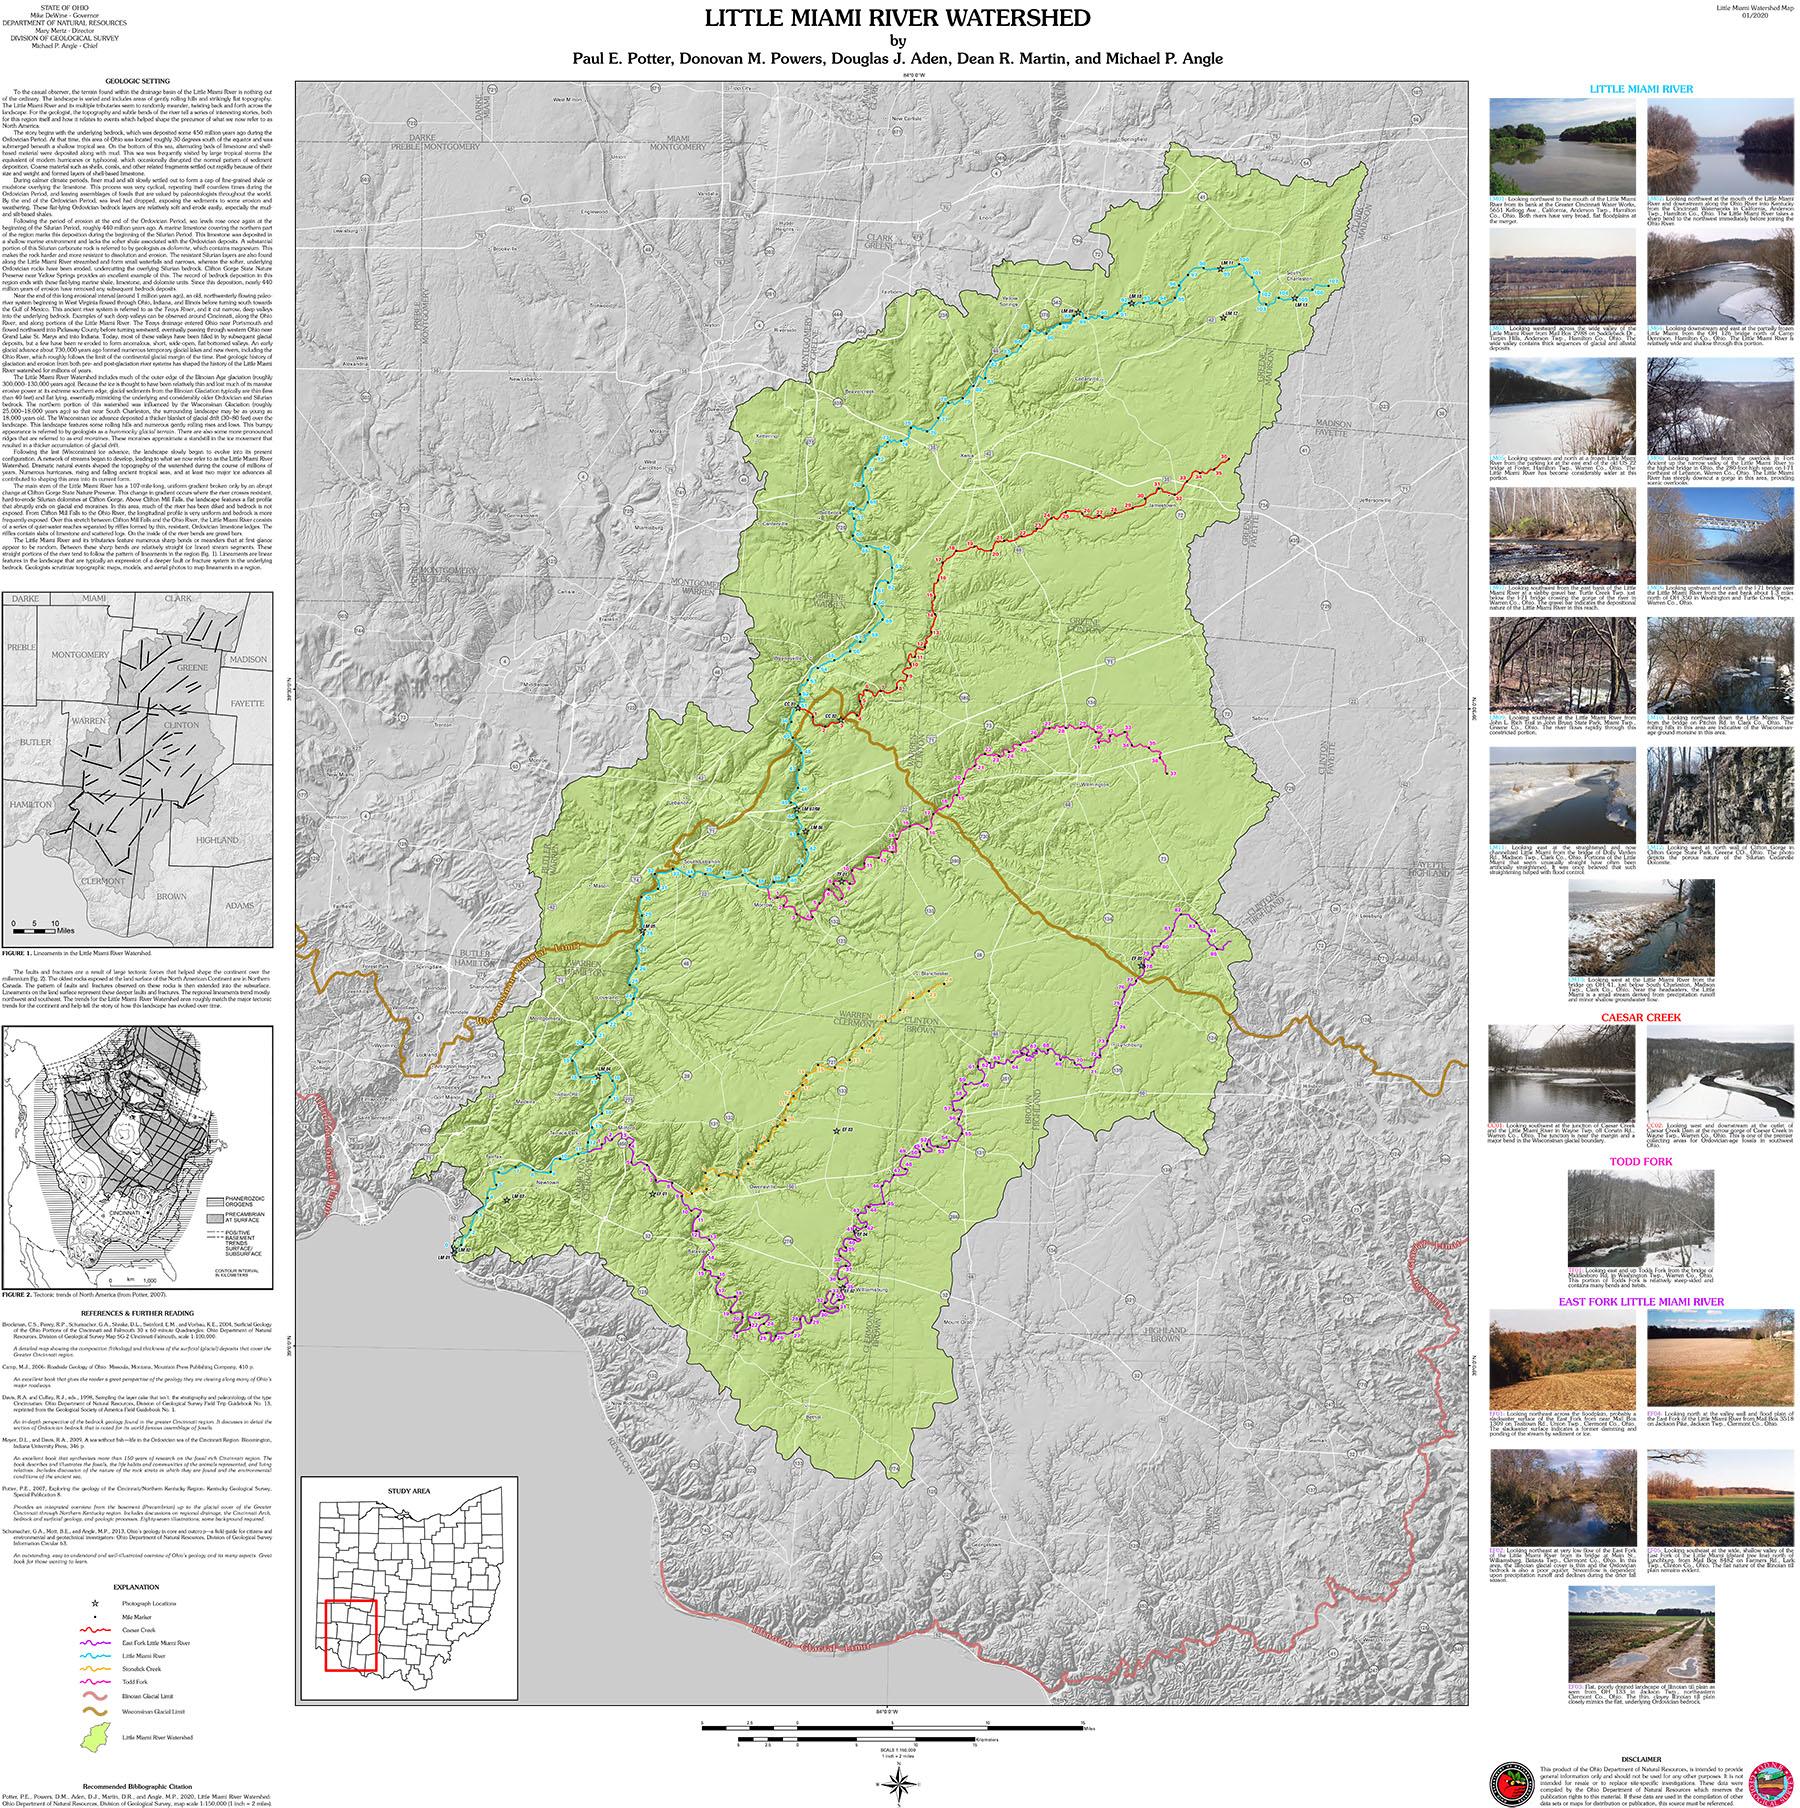 little miami river canoe map New Map Highlights The Little Miami River Watershed In little miami river canoe map